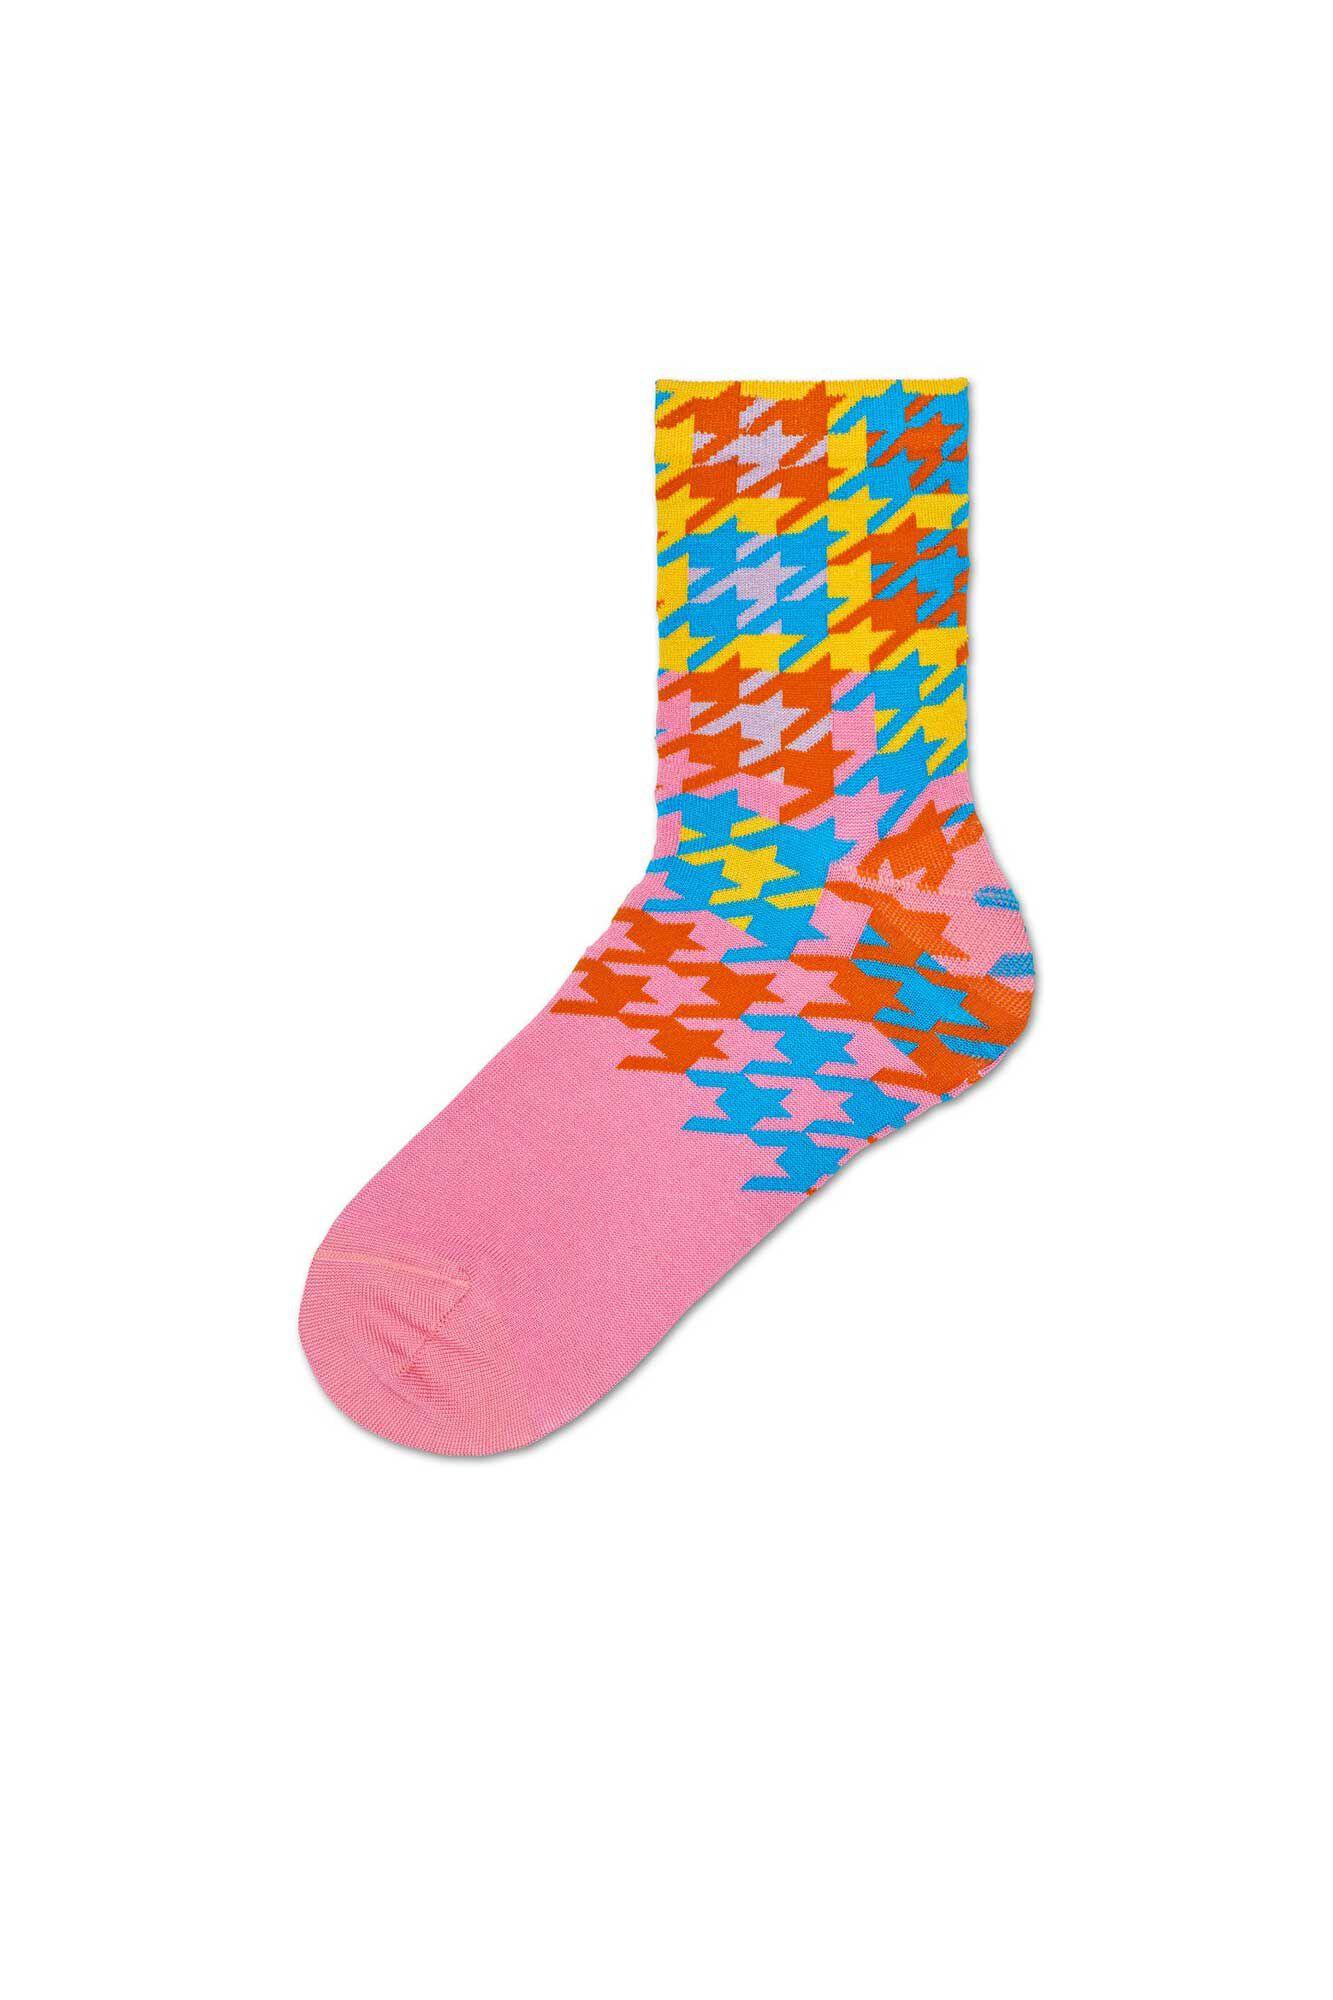 Marcia ankle sock SISMCI12, 3300